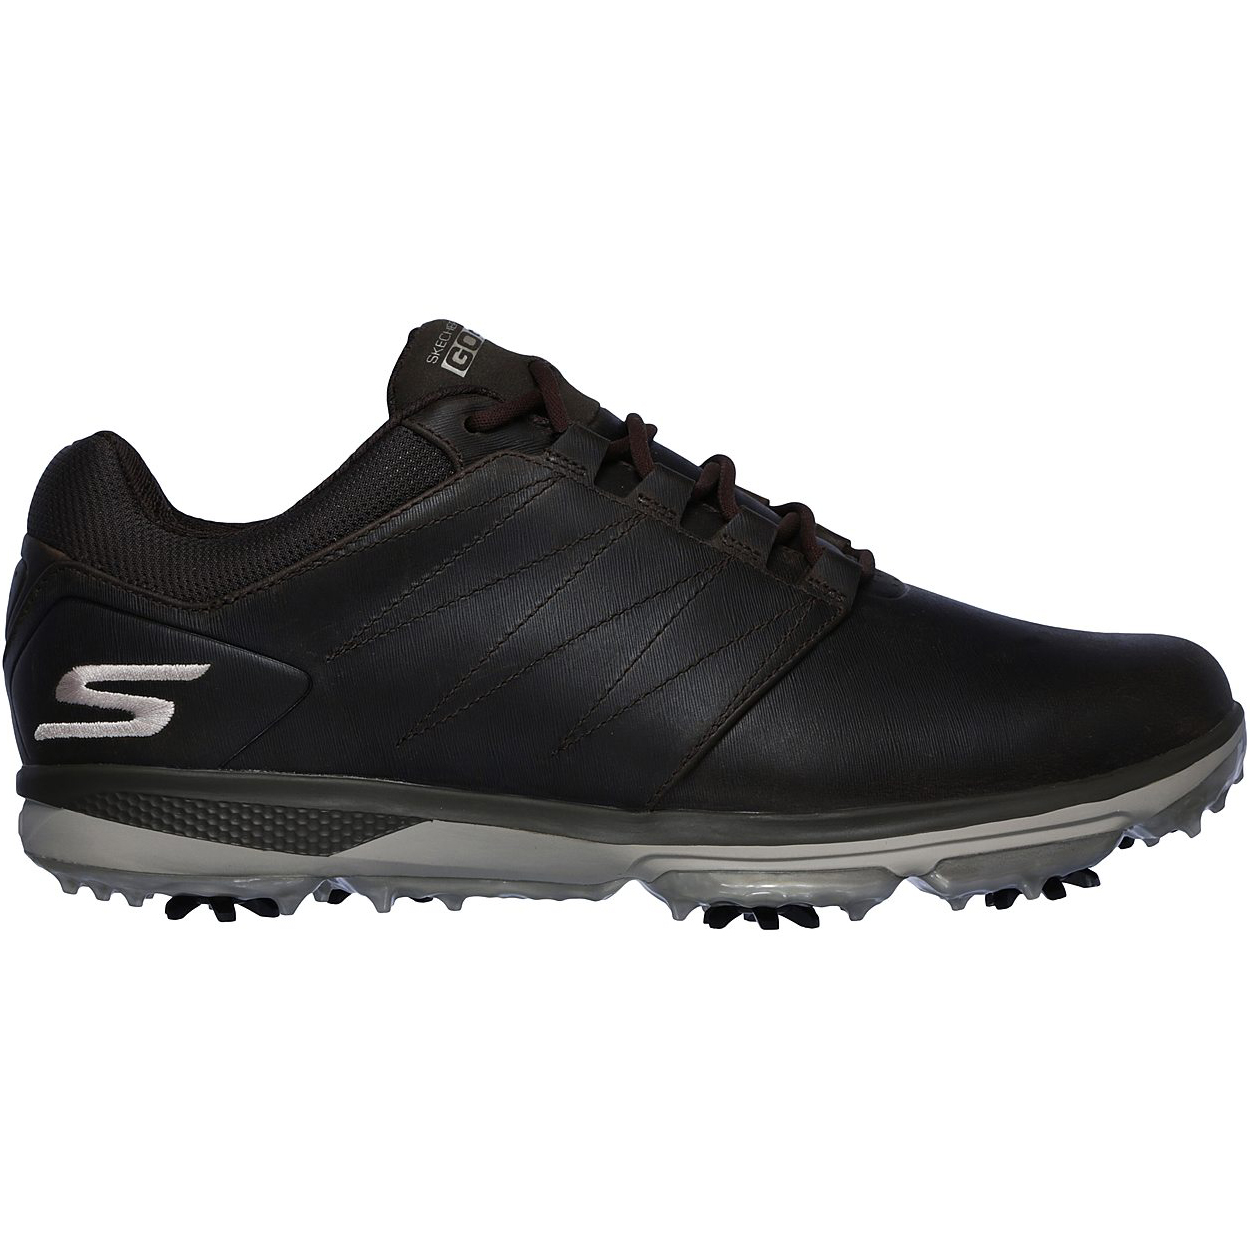 Skechers-Men-039-s-GOgolf-Pro-4-LX-Leather-Golf-Shoe-Brand-New thumbnail 15